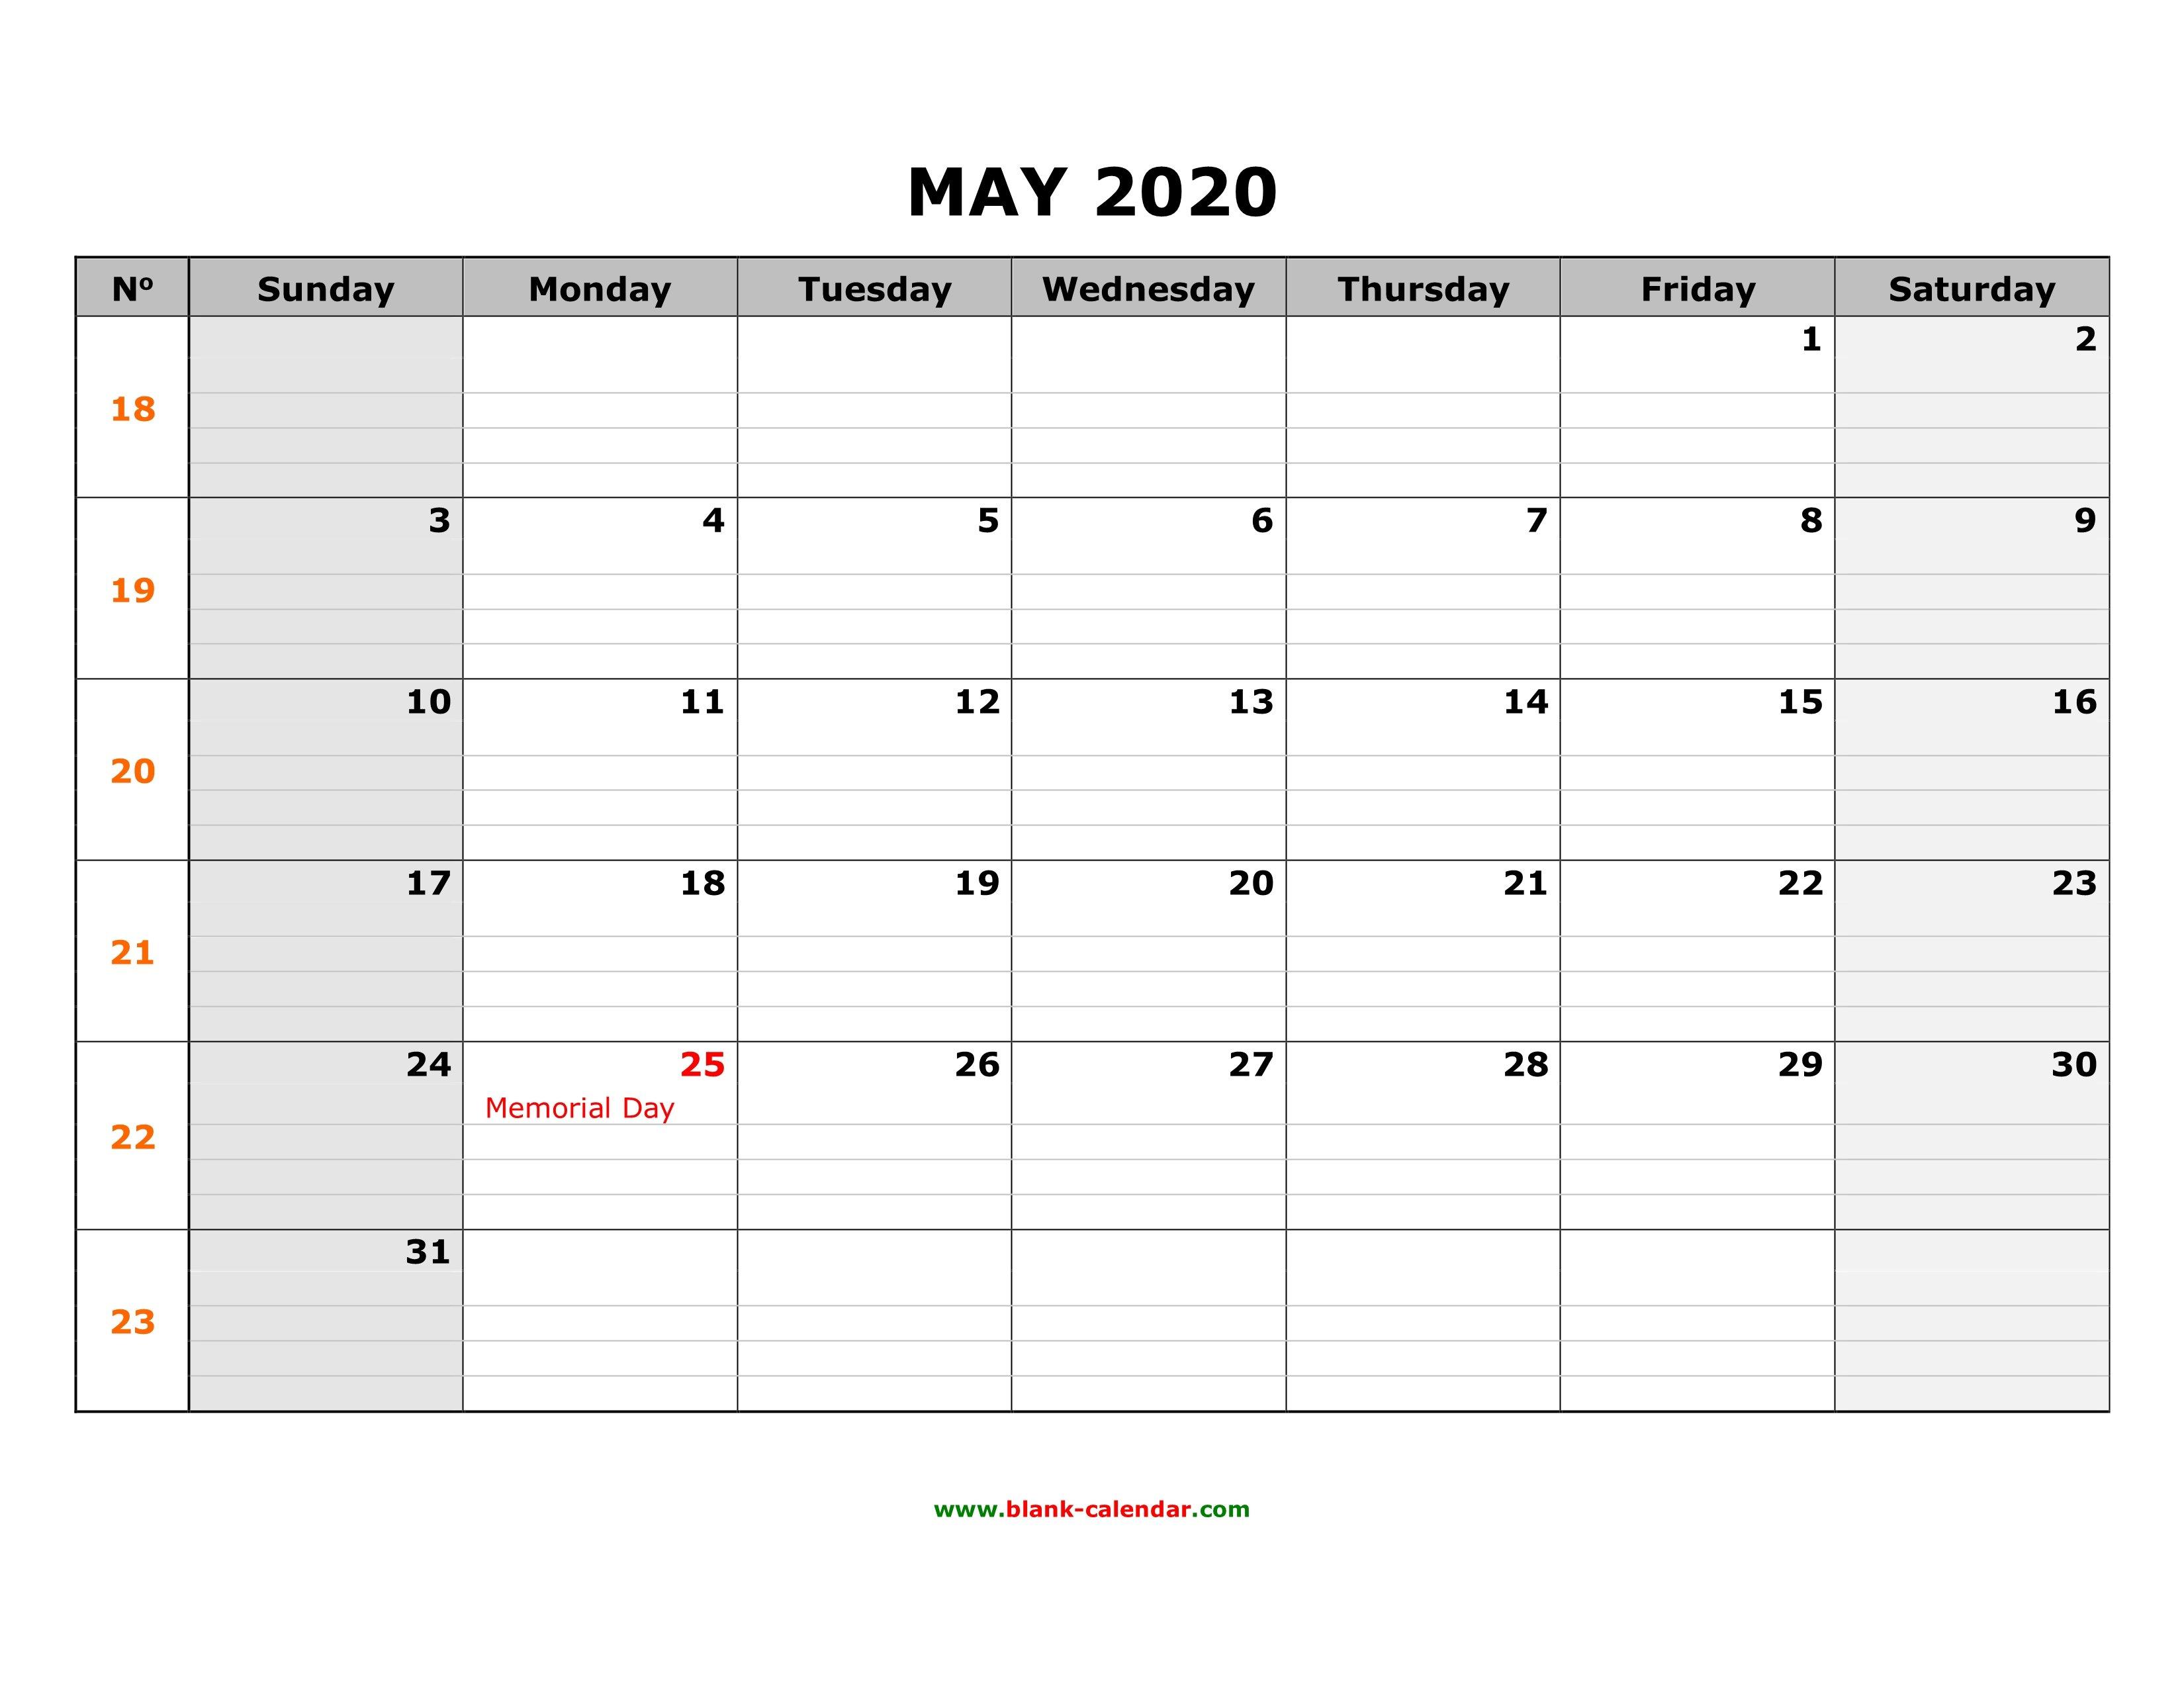 Free Download Printable May 2020 Calendar, Large Box Grid Free Printable Calendar Large Blocks